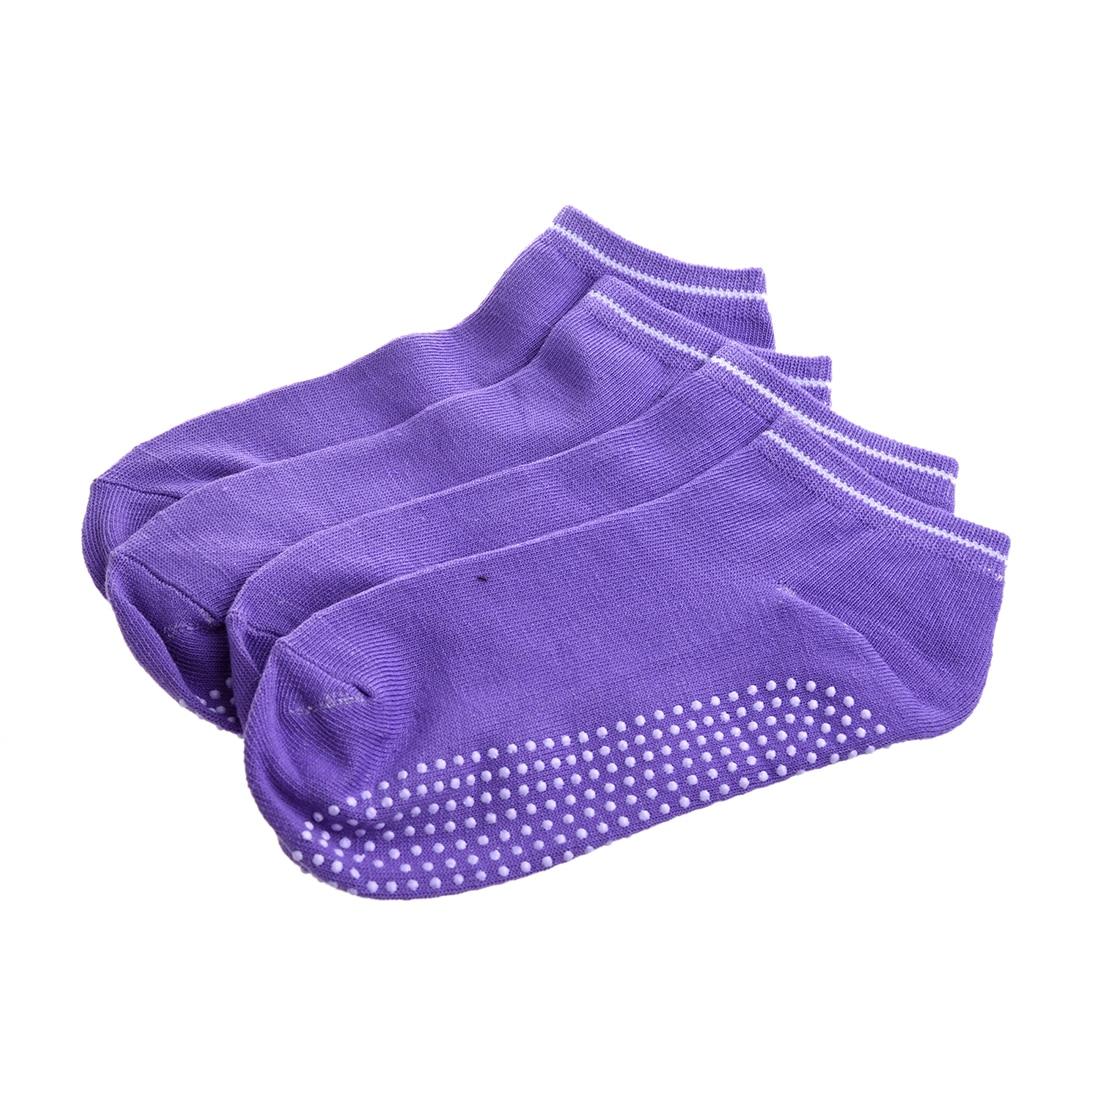 SYB 2016 NEW 2 pairs Socks with non-slip massage Granules for women - Purple